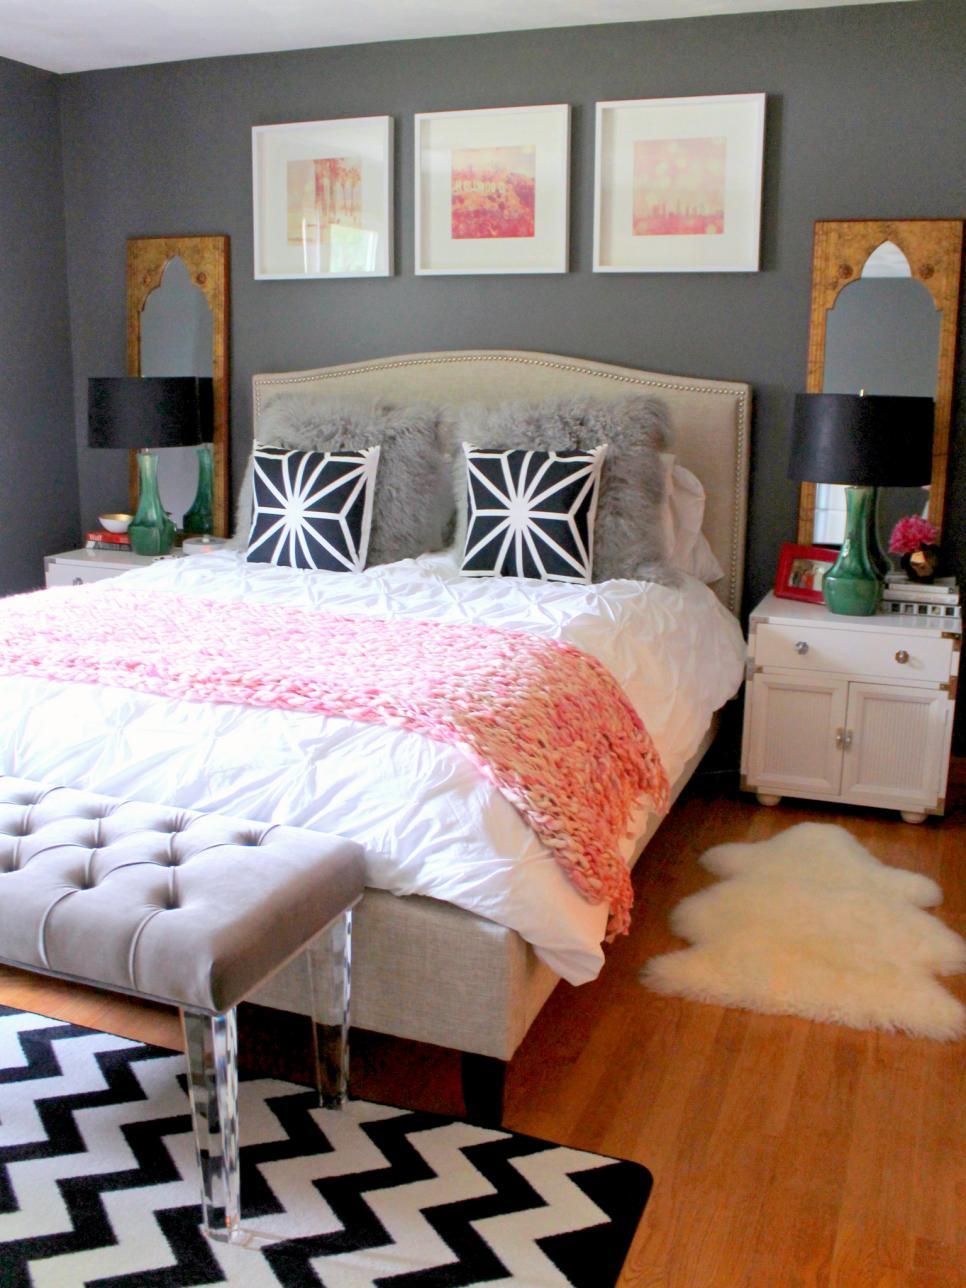 50 Bedroom Decorating Ideas for Teen Girls | HGTV